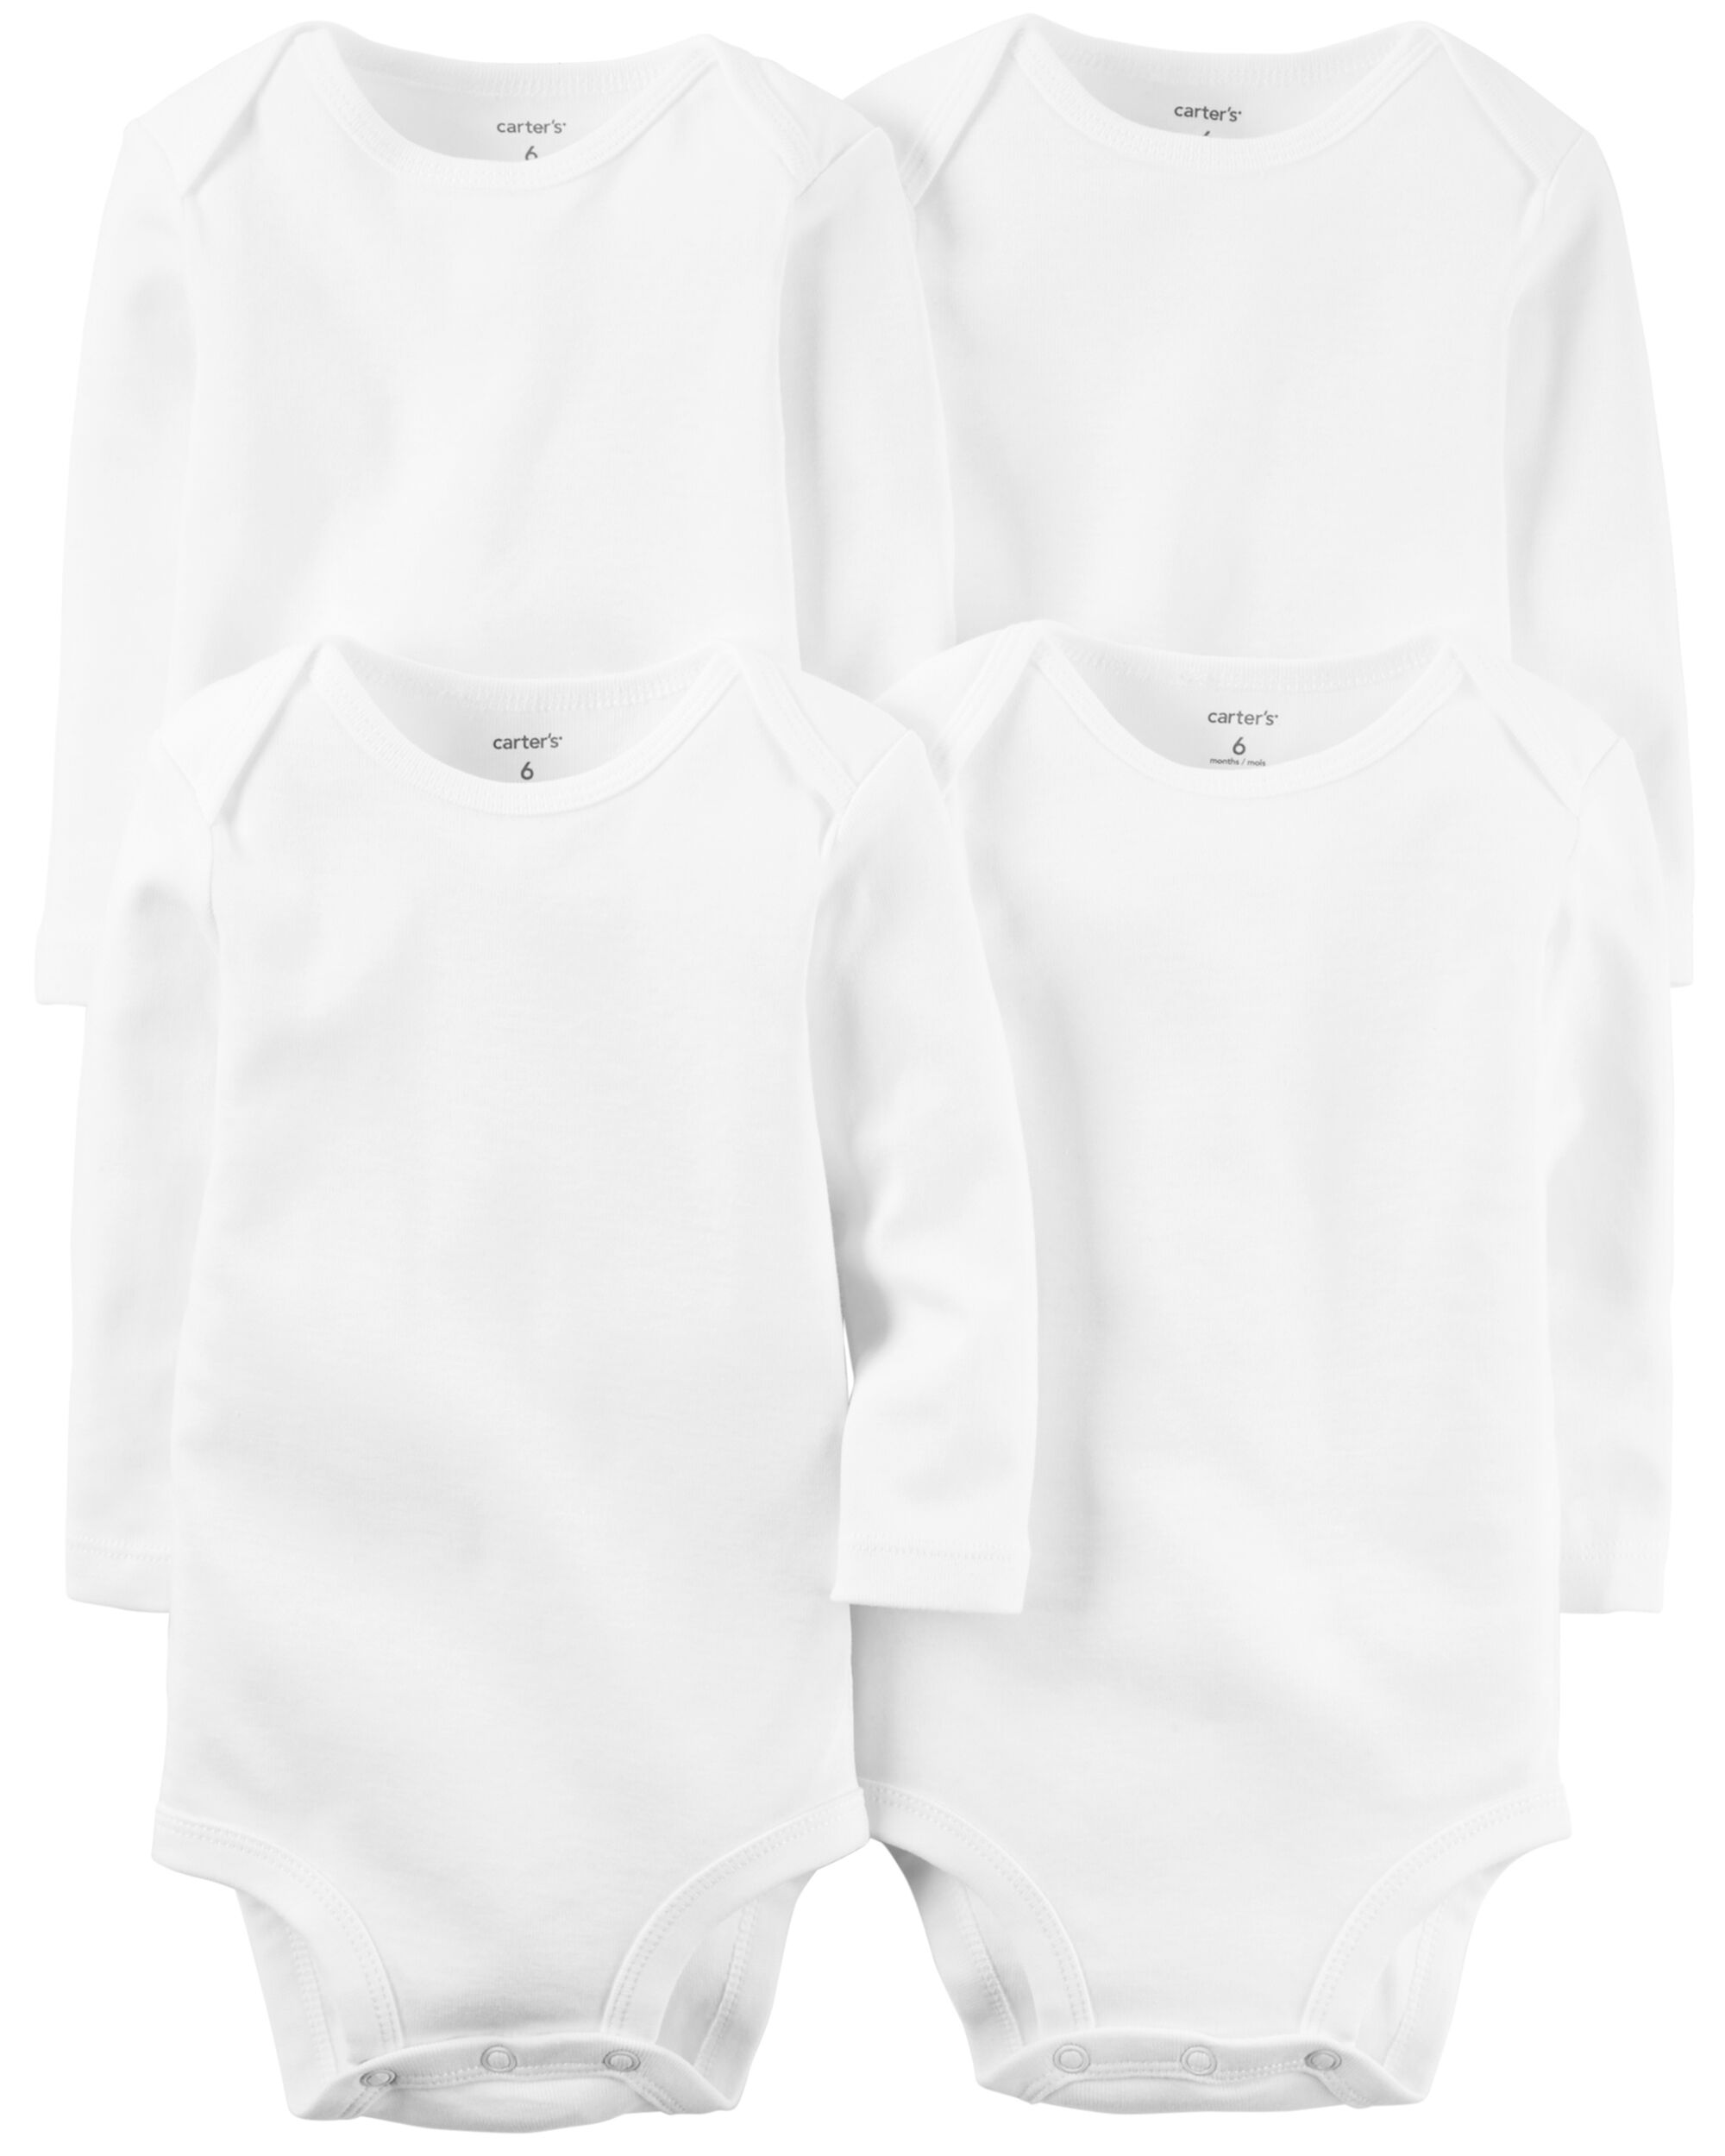 Carters 4-Pack Long-Sleeve Original Bodysuits